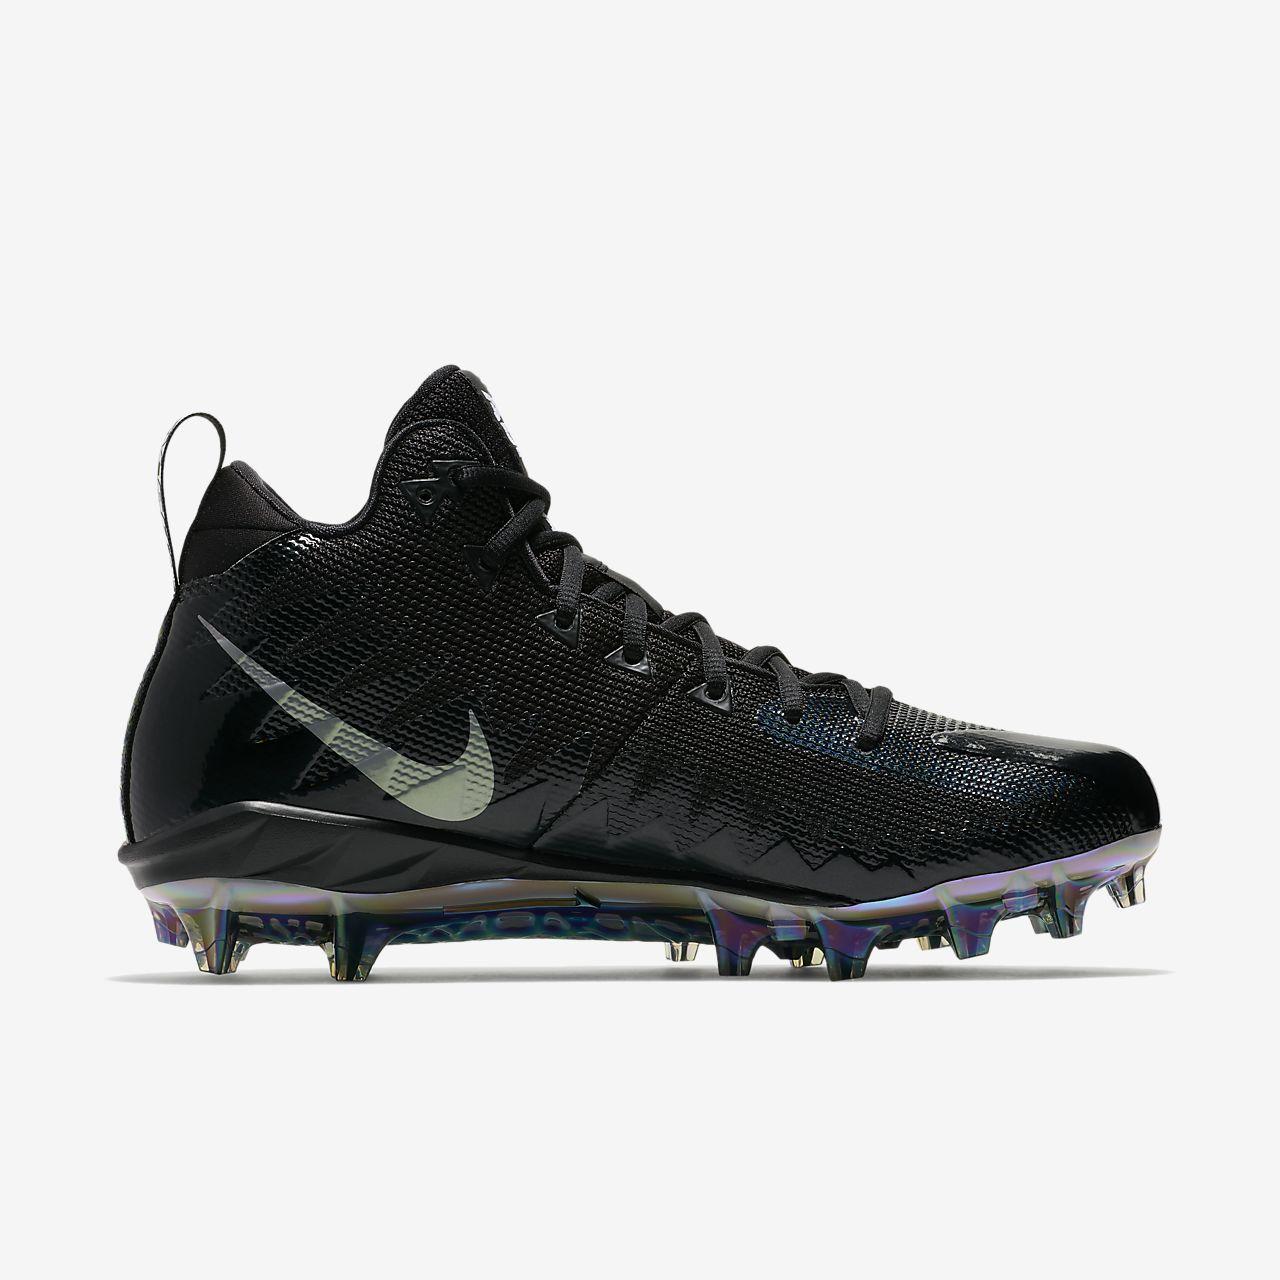 ... Nike Alpha Menace Pro Mid Men's Football Cleat